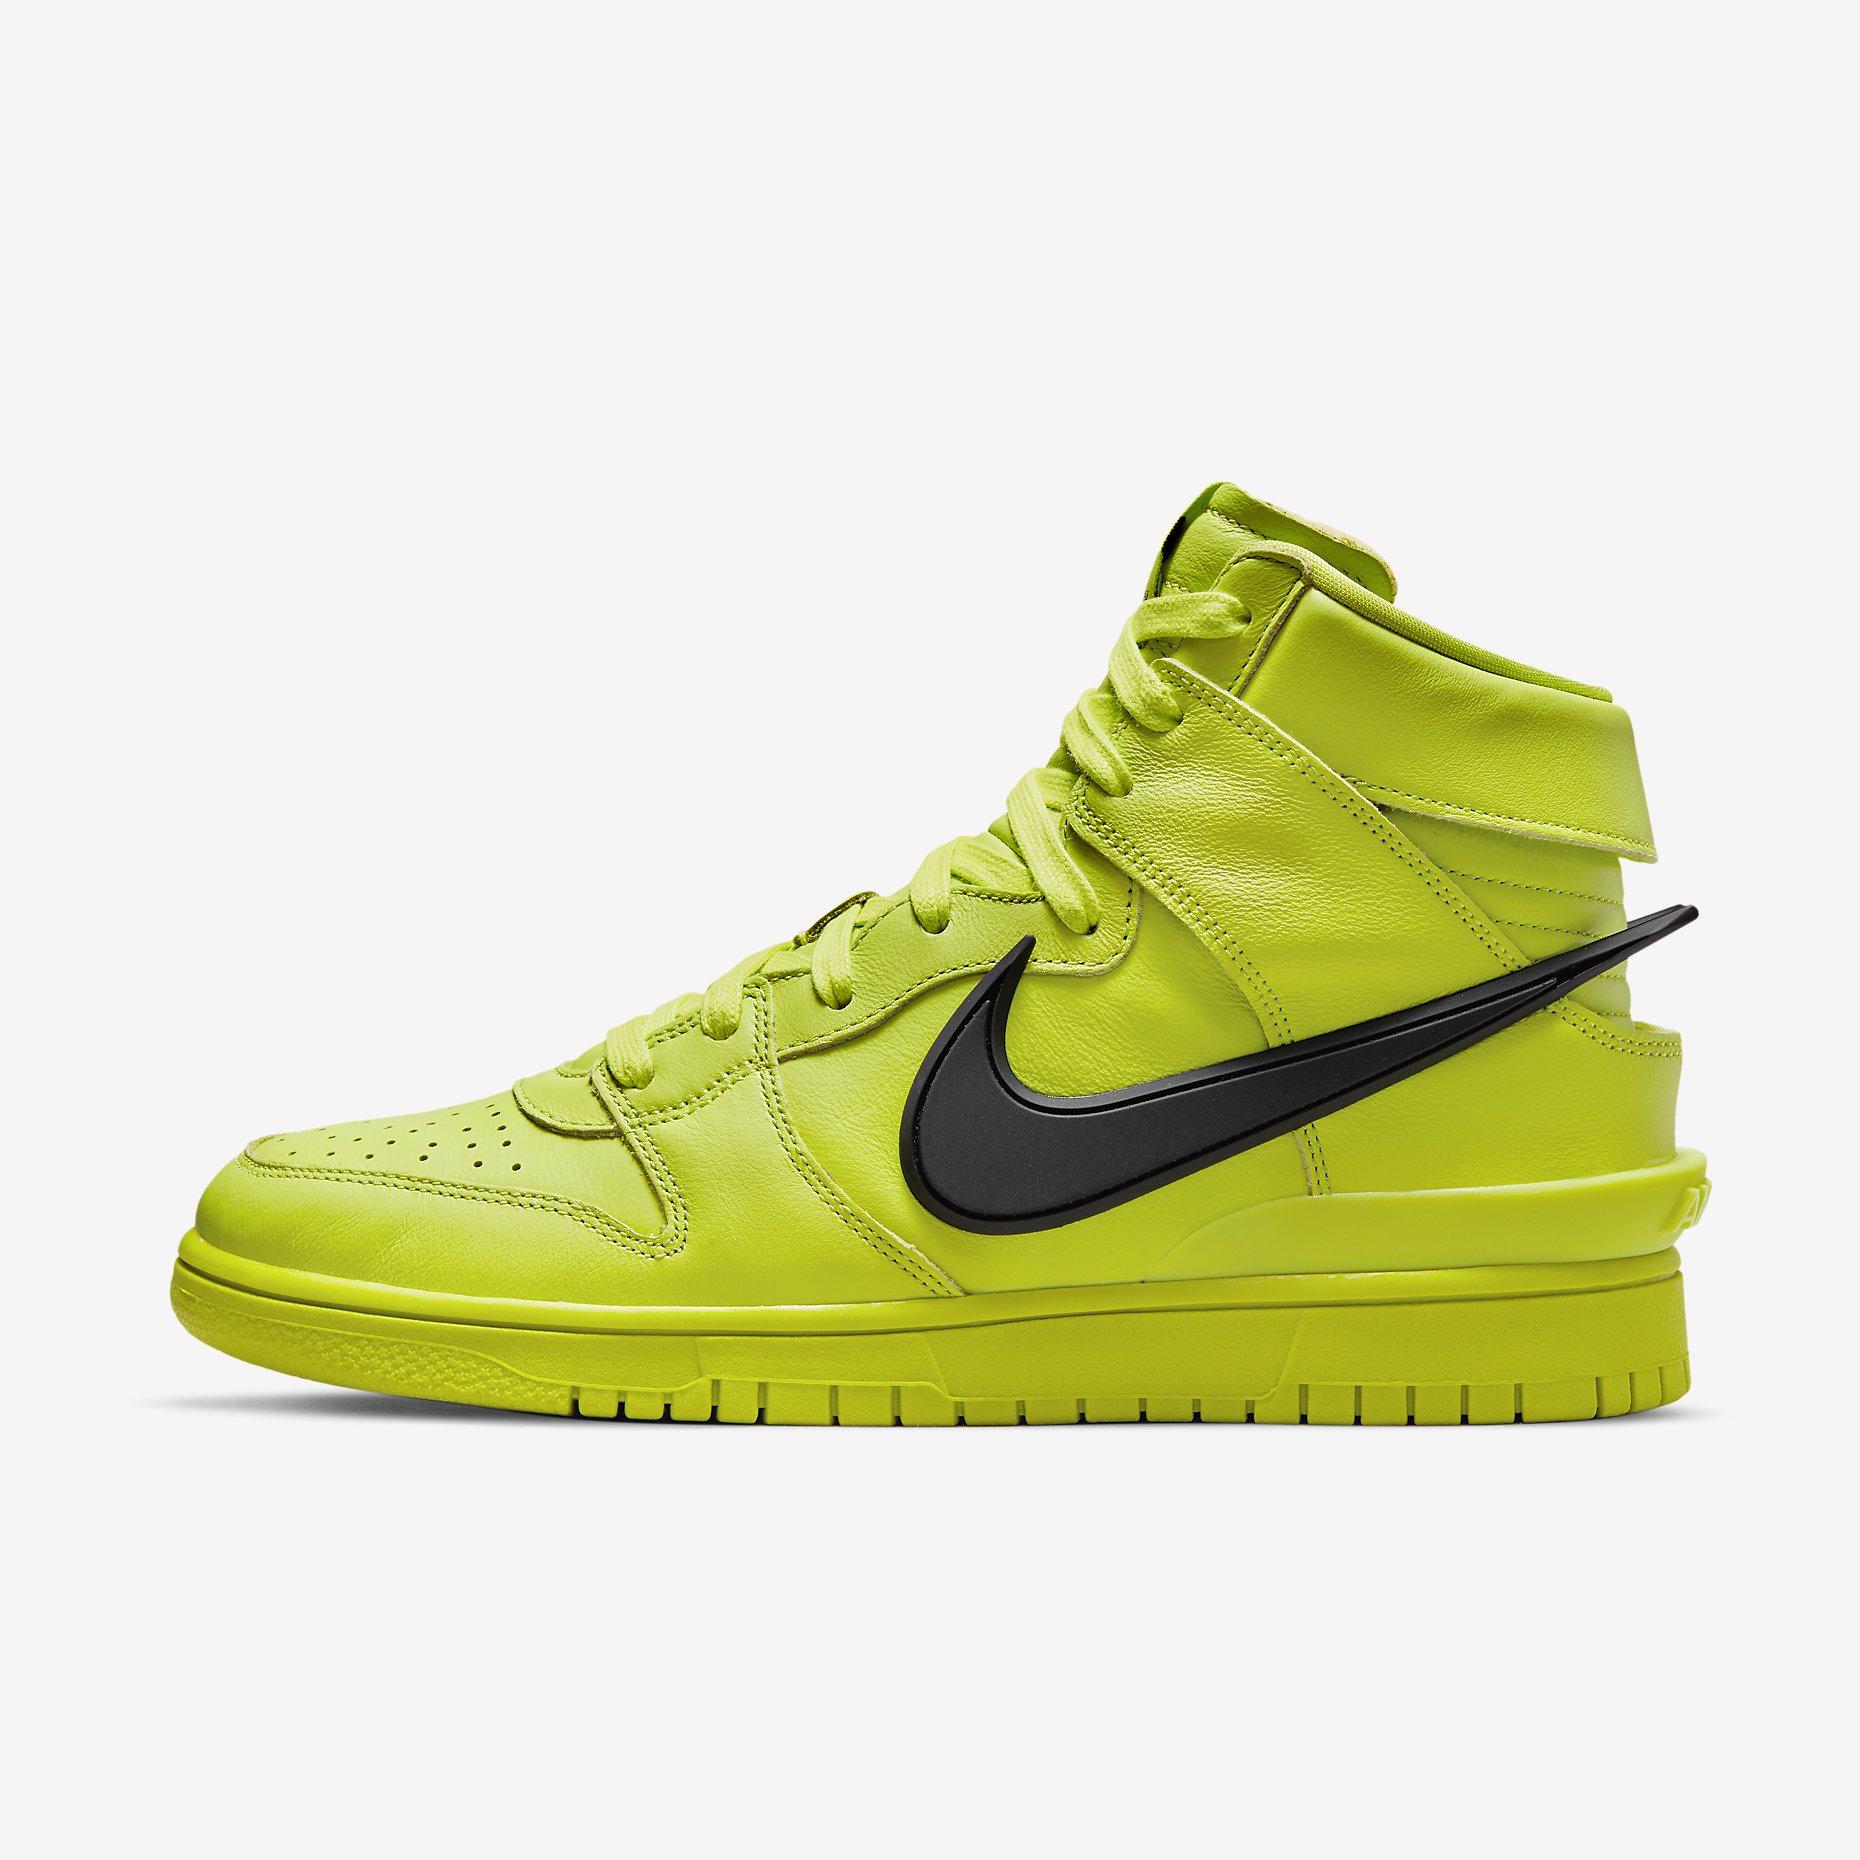 Ambush x Nike Dunk High 'Flash Lime'}